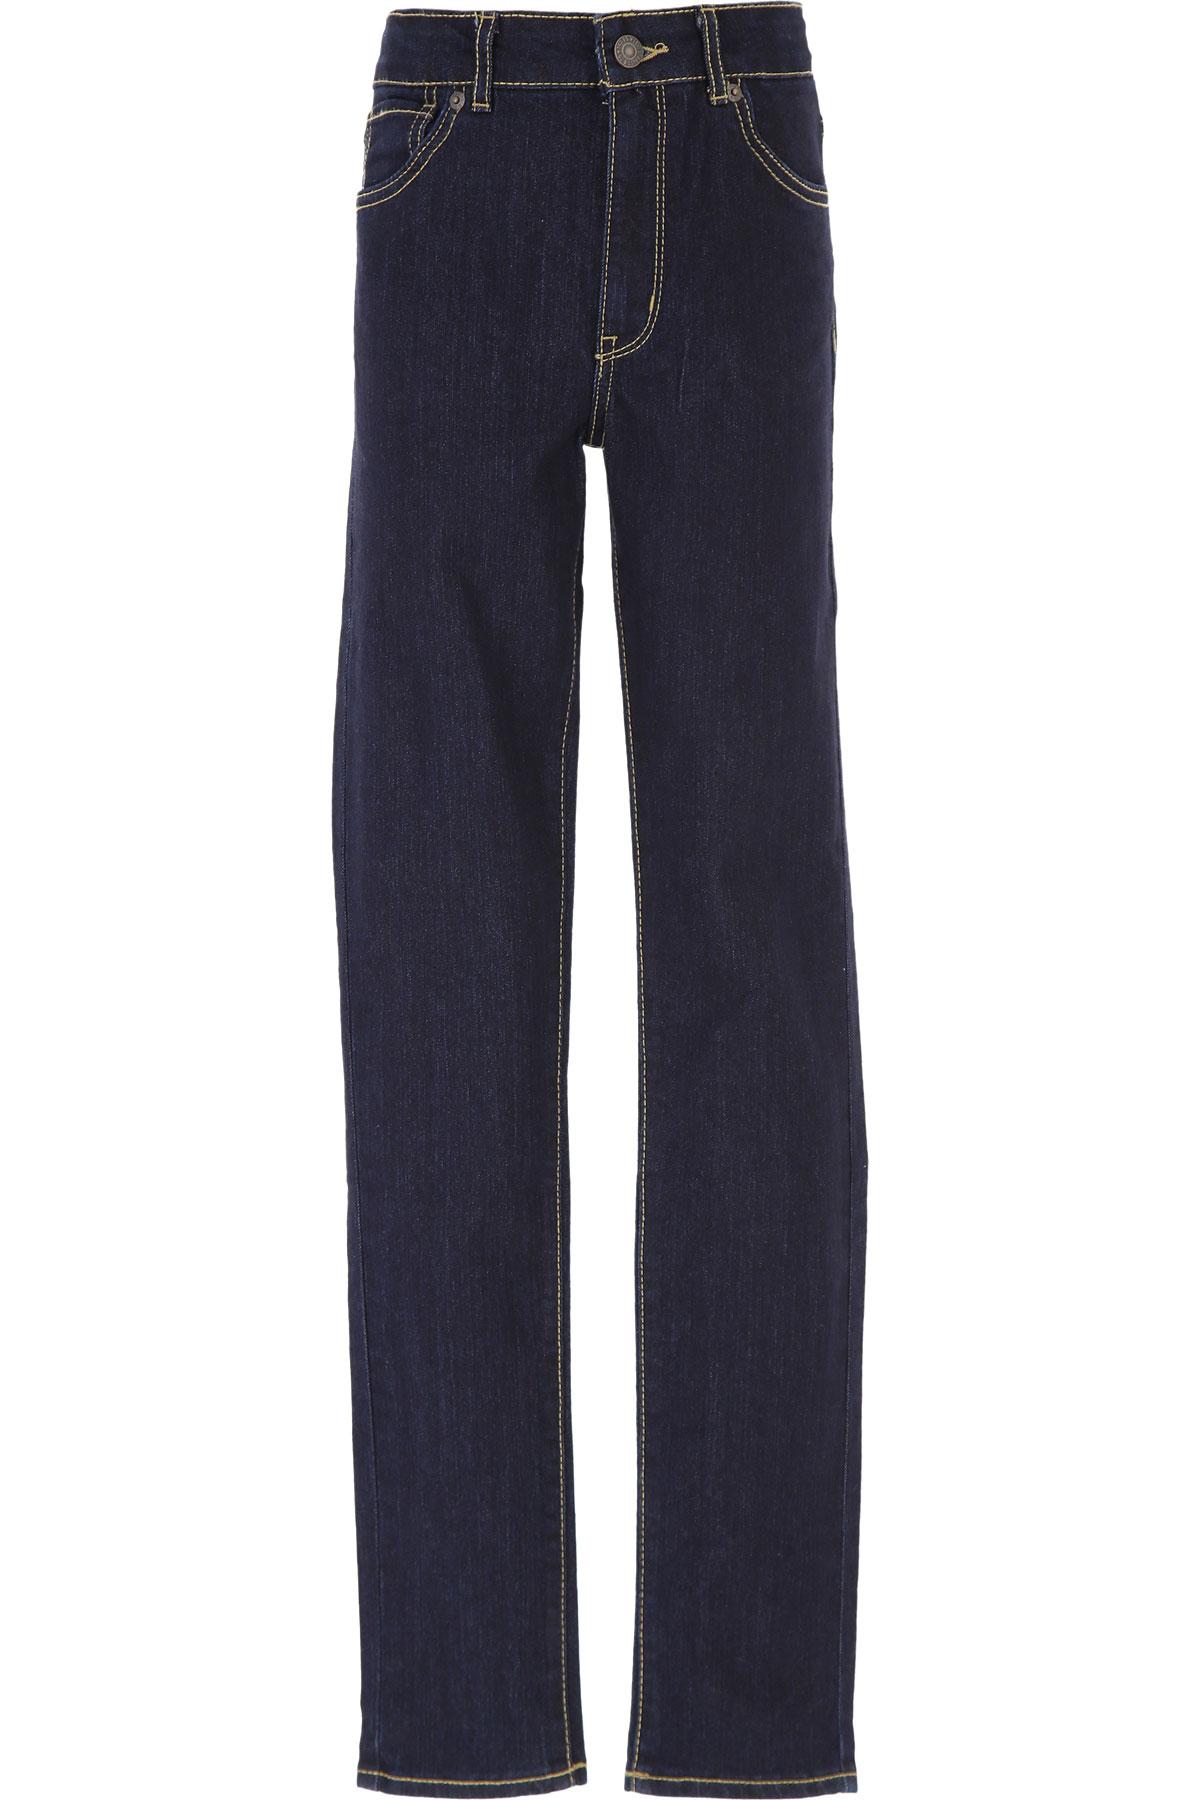 Levis Kids Jeans for Girls On Sale, Dark Blue Denim, Cotto, 2019, 10Y 12Y 14Y 16Y 8Y